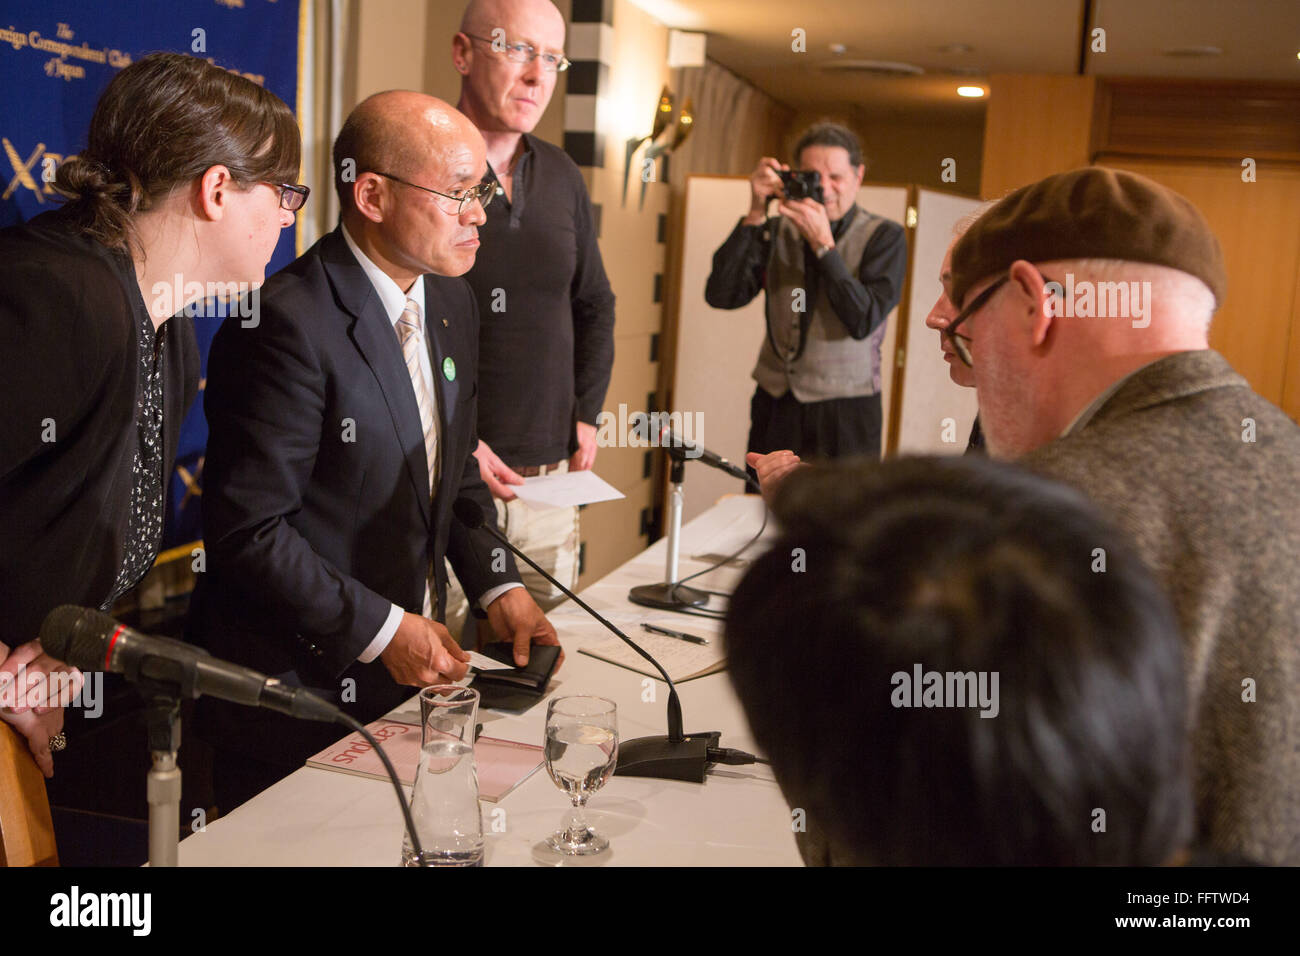 Tokyo, Japan. 17th February, 2016. Katsunobu Sakurai, Mayor of Minamisoma City in Fukushima speaks at the Foreign - Stock Image